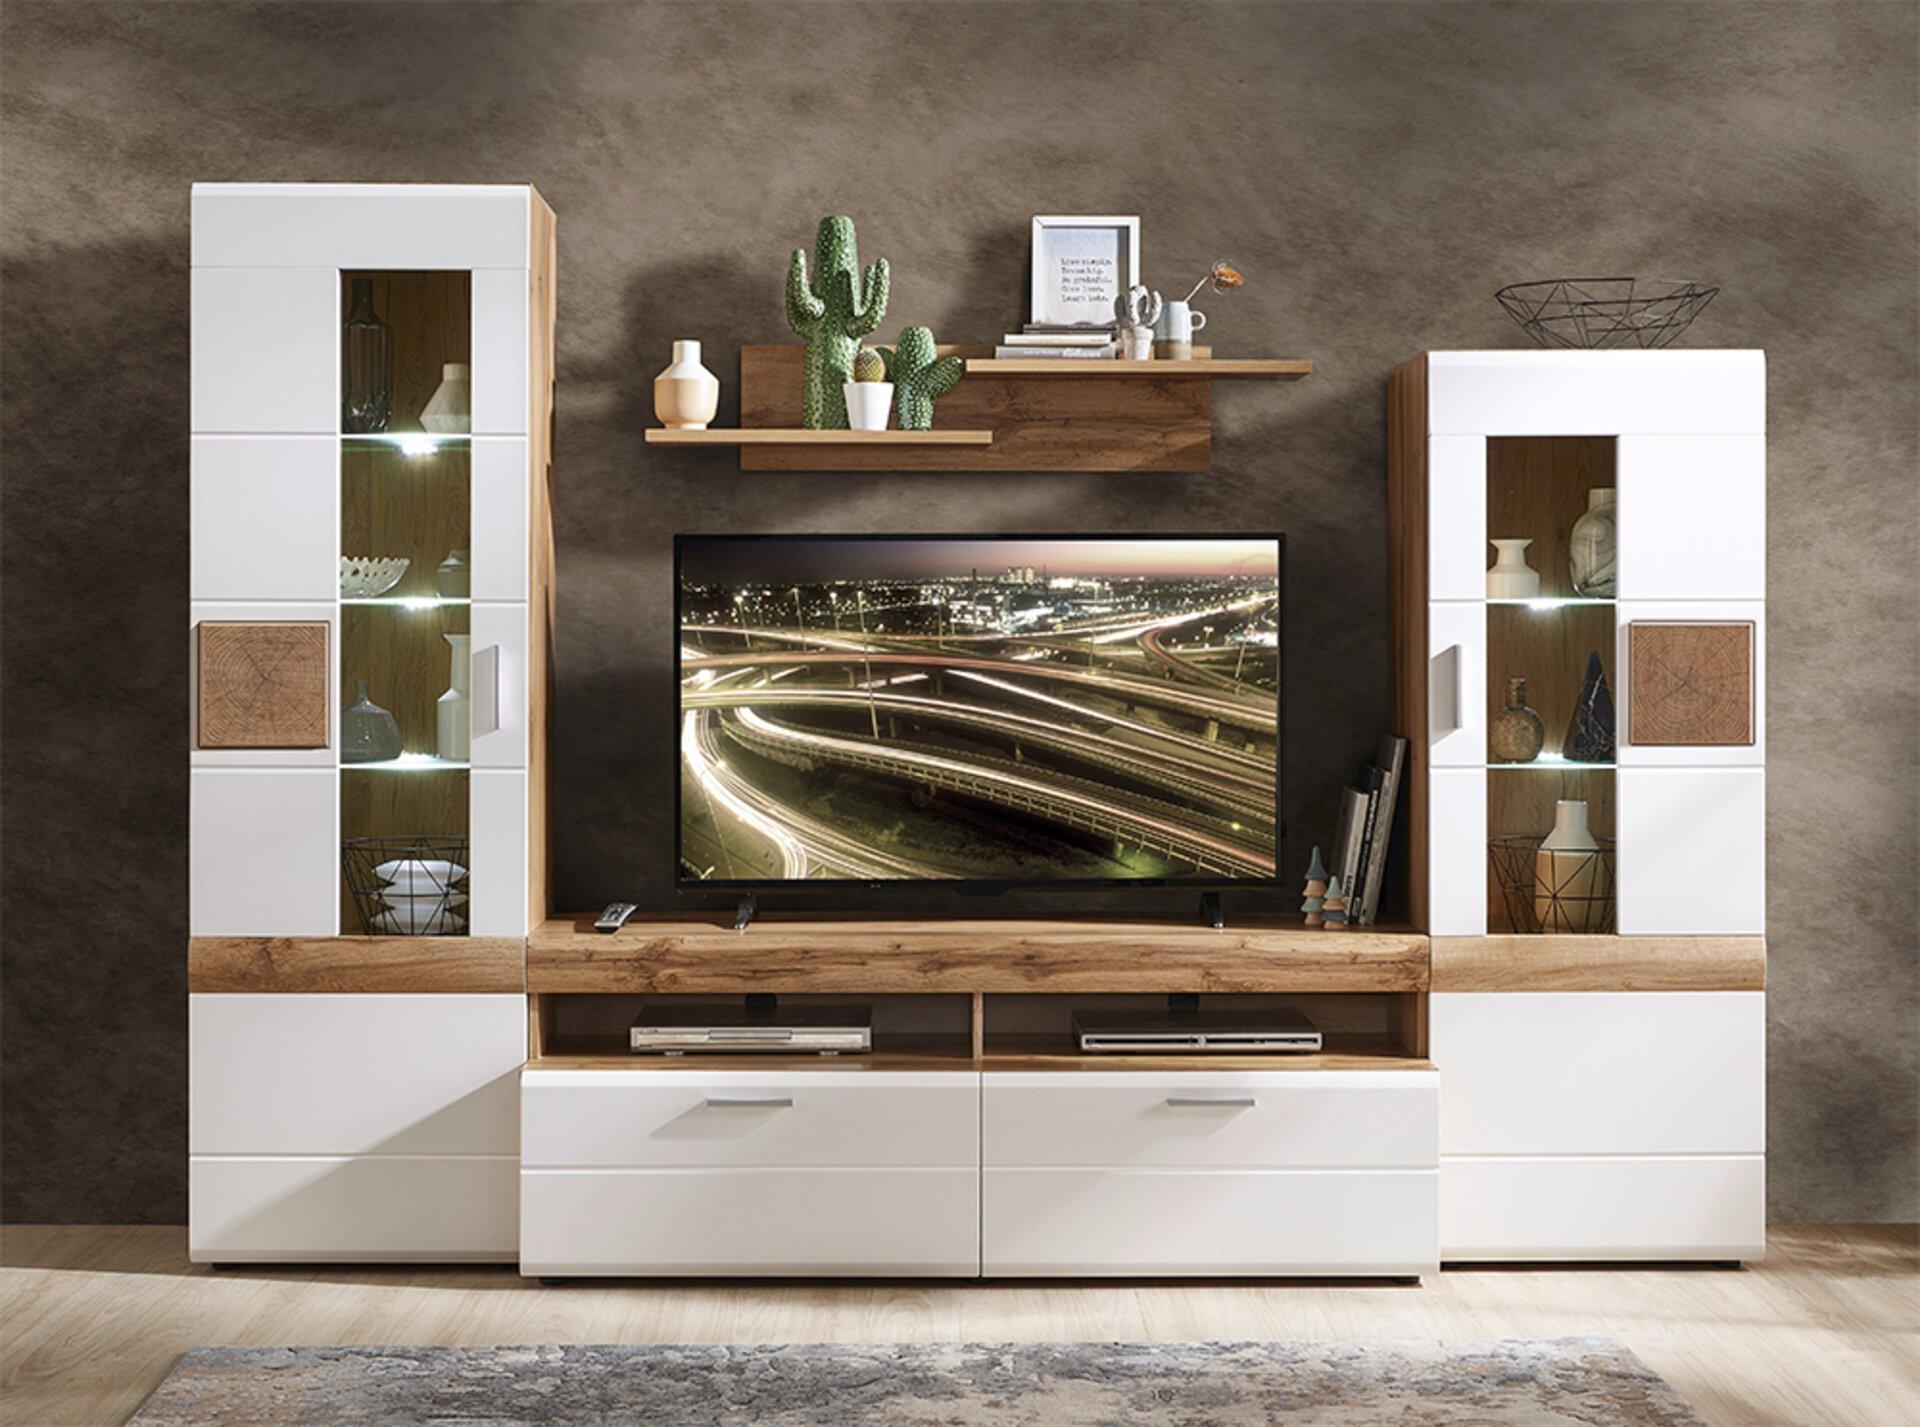 Wohnwand LE MANS CELECT Holzwerkstoff braun 50 x 194 x 280 cm